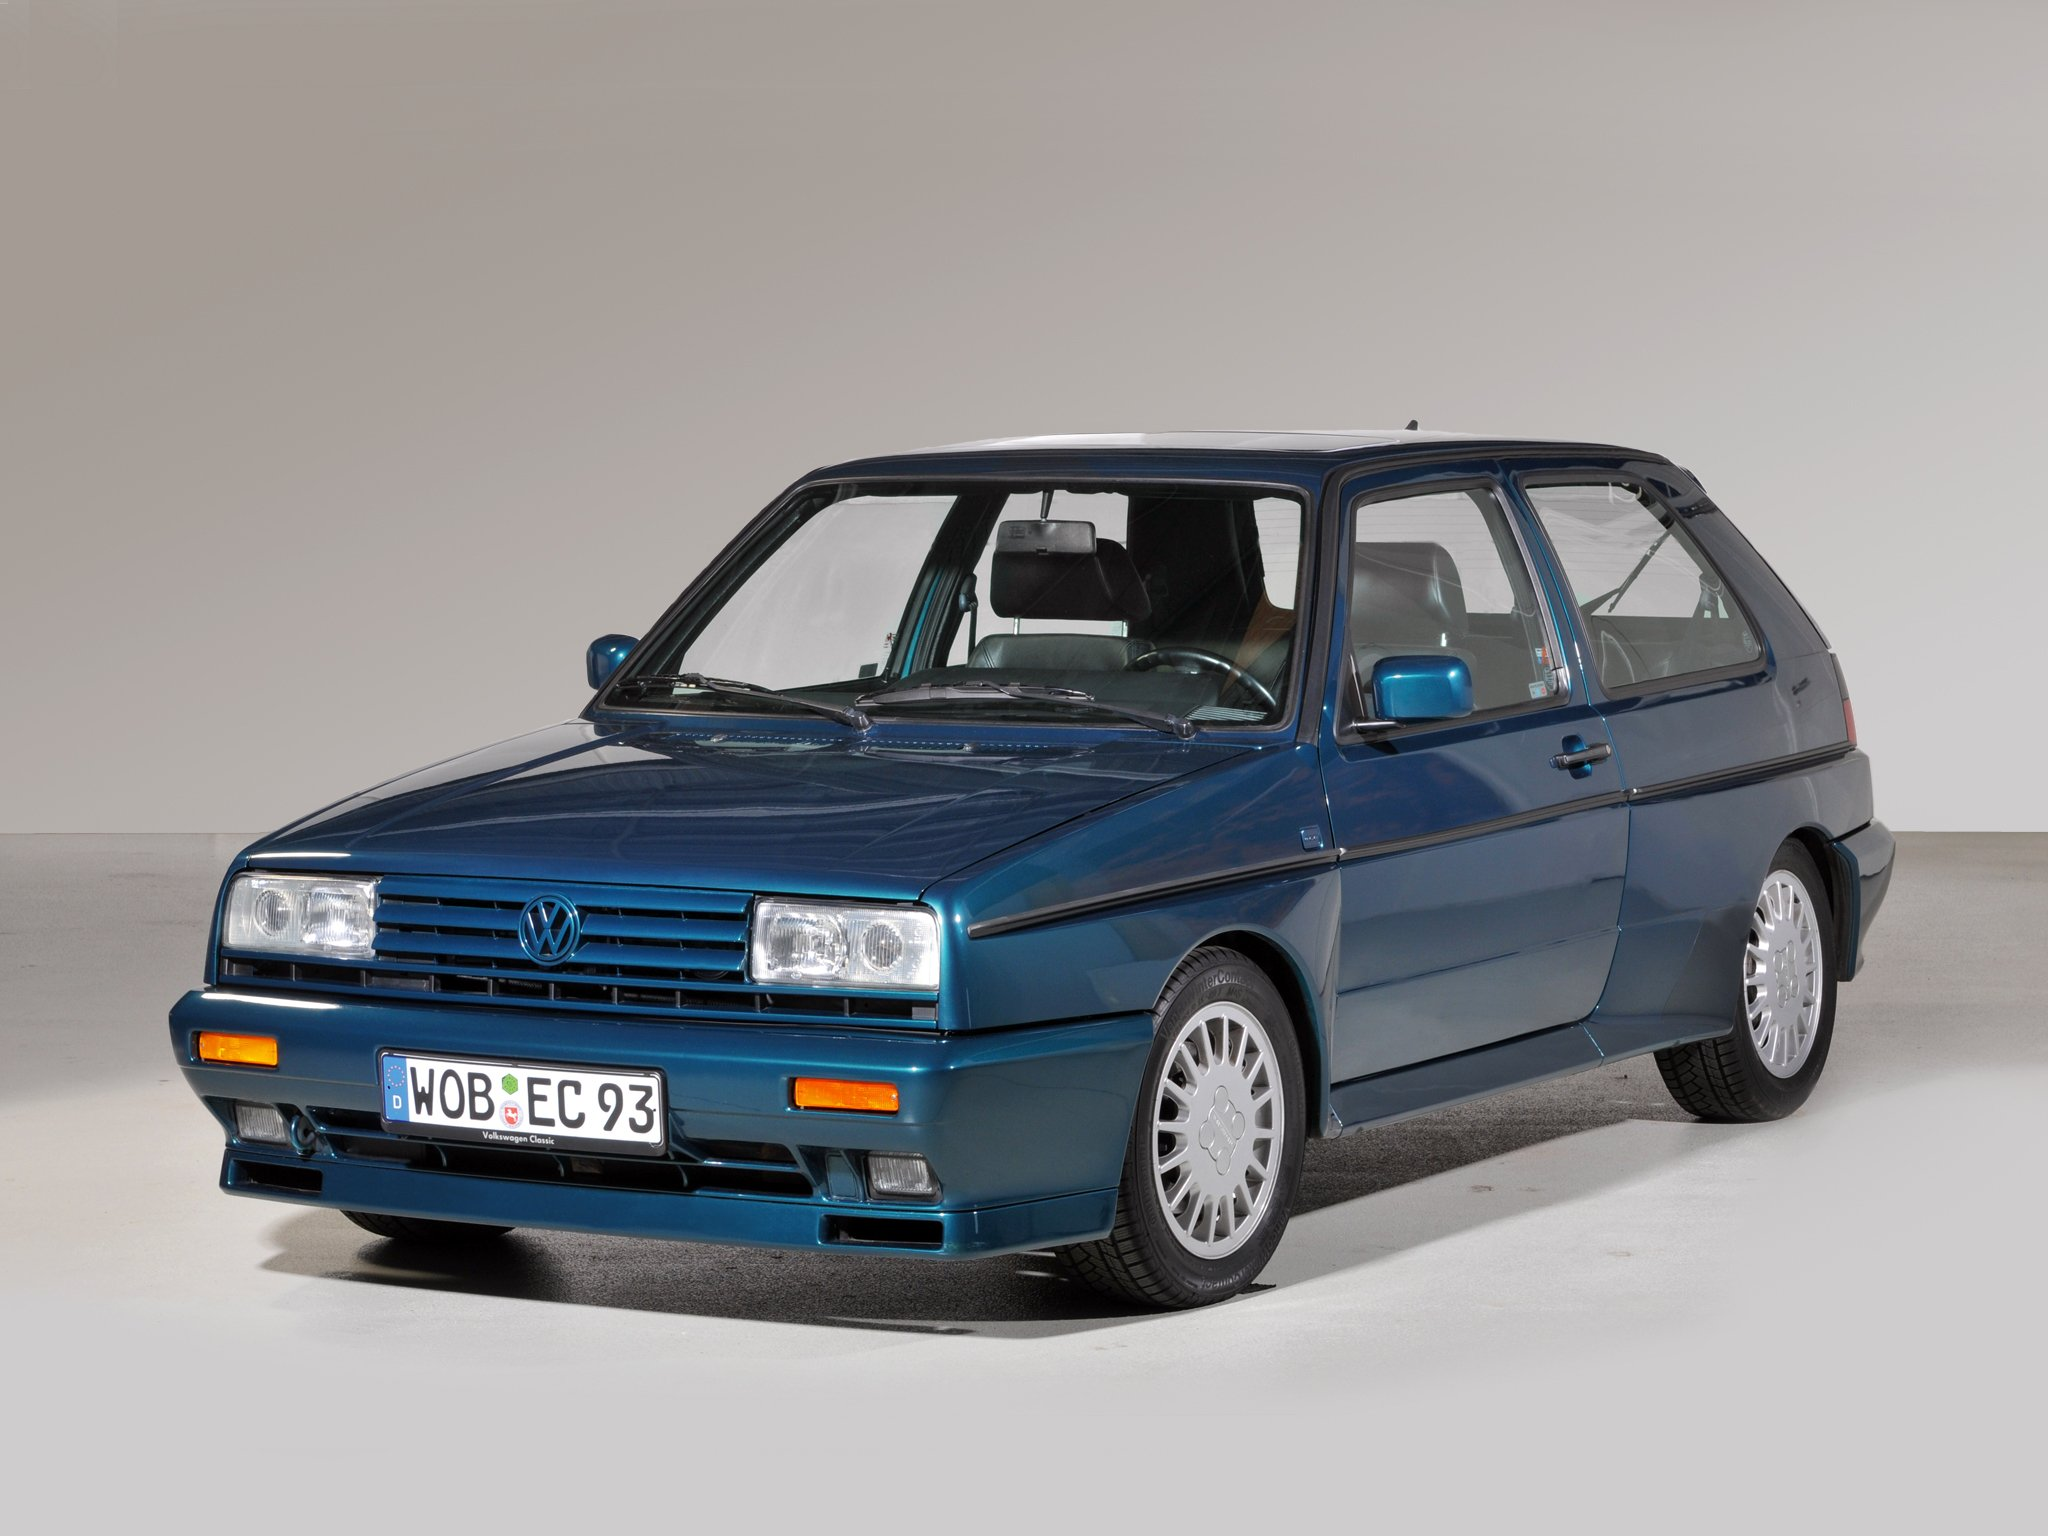 1989 91 volkswagen golf rallye g60 typ 1g f wallpaper. Black Bedroom Furniture Sets. Home Design Ideas